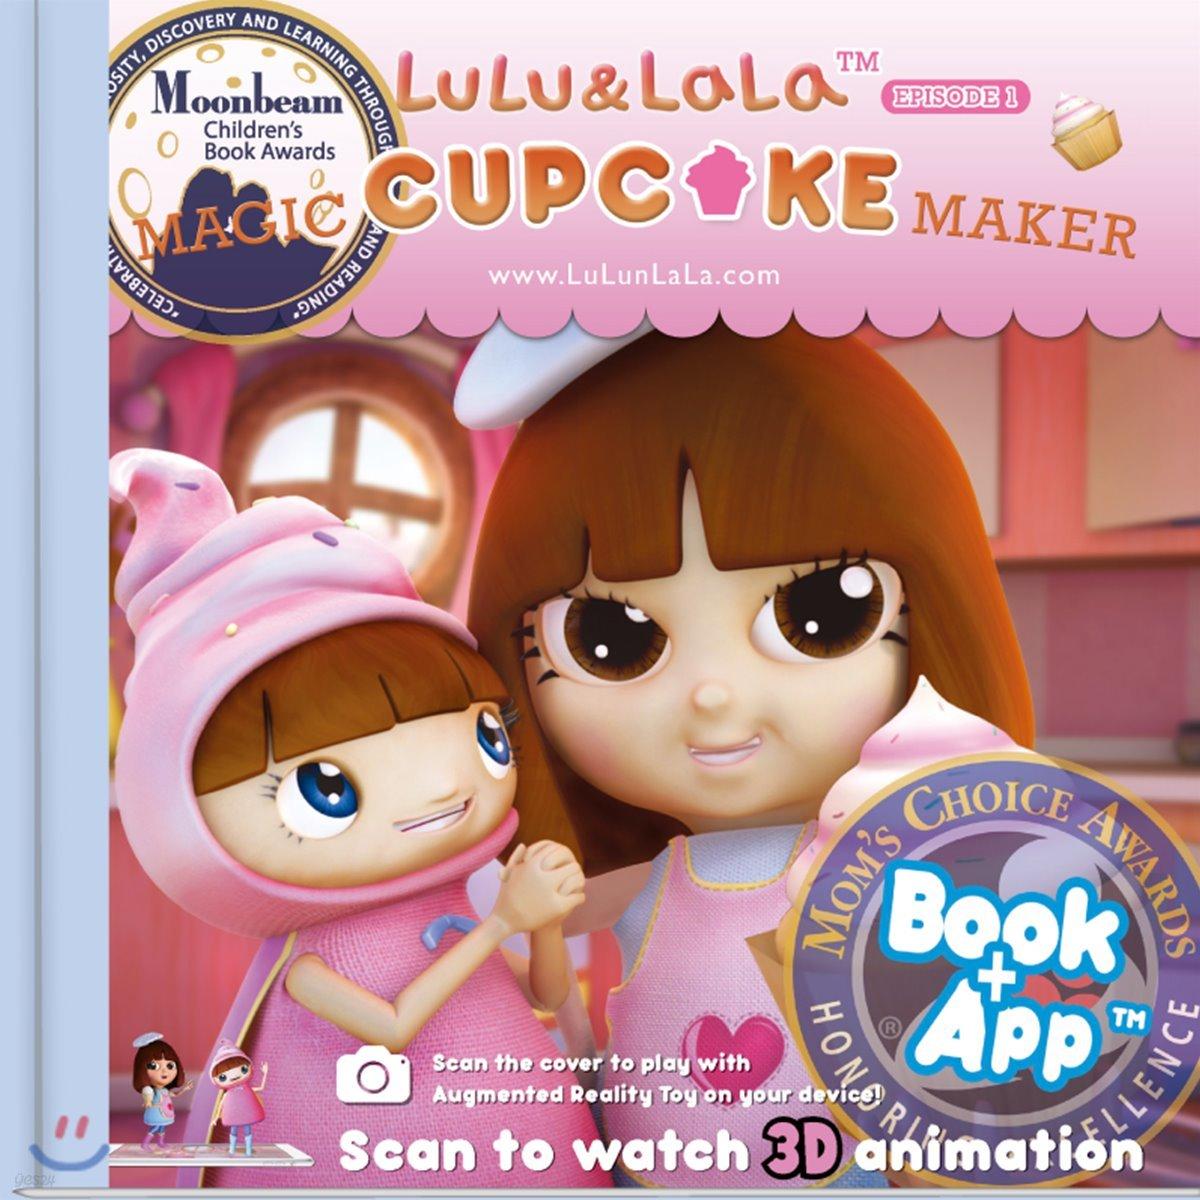 (AR scanning) LuLu & LaLa #1 : Magic Cupcake Maker